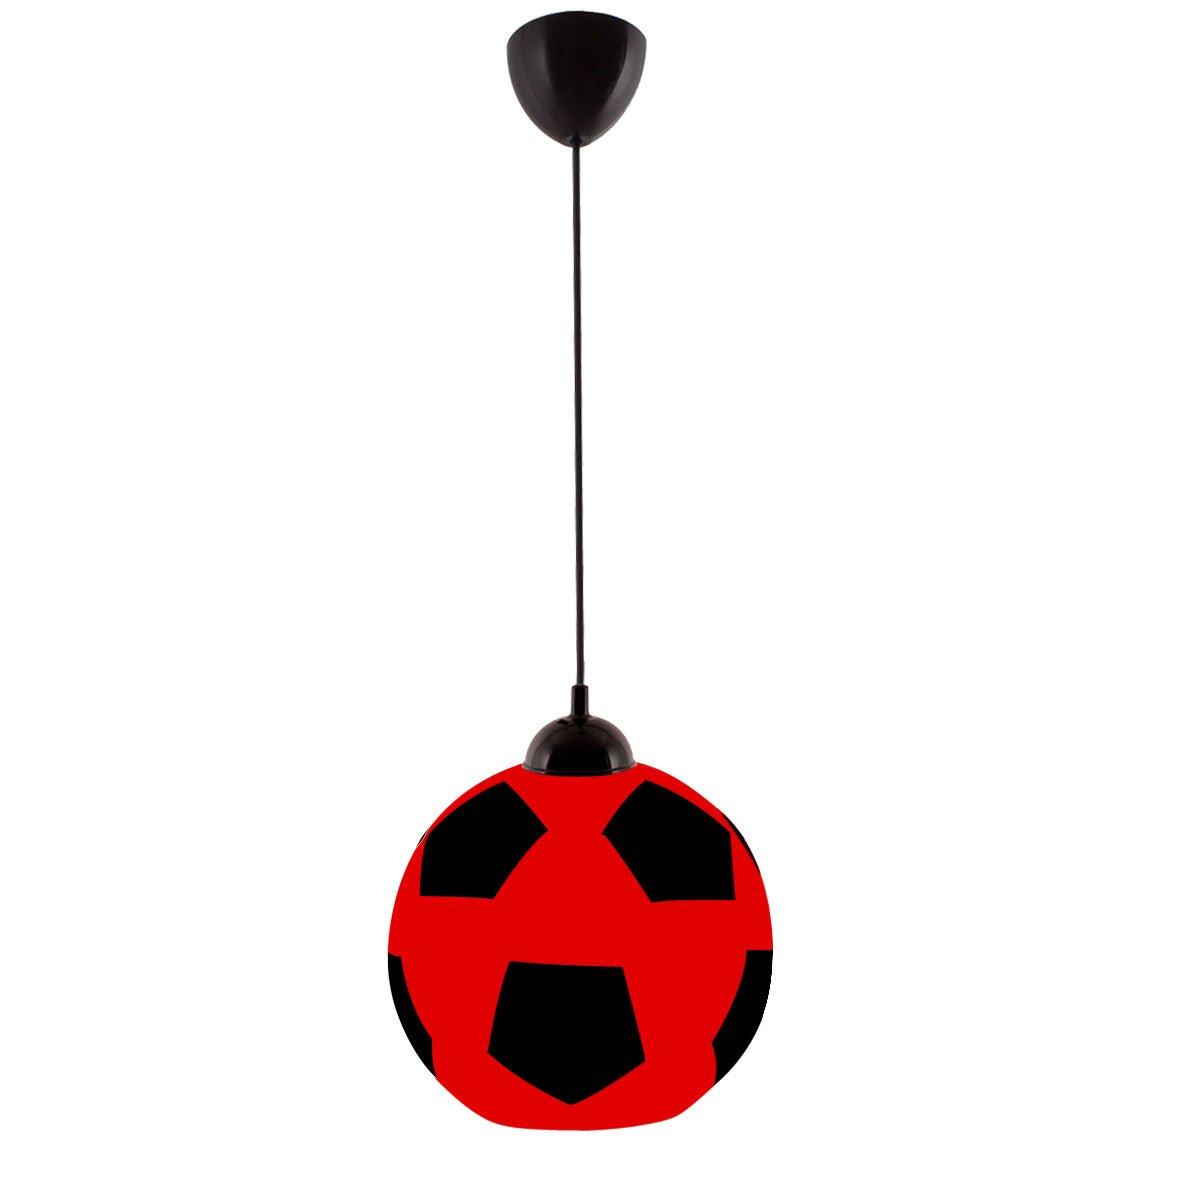 Atlanta soccer ball pendant high qaulity blown glass burgundy black by art win lighting amazon com